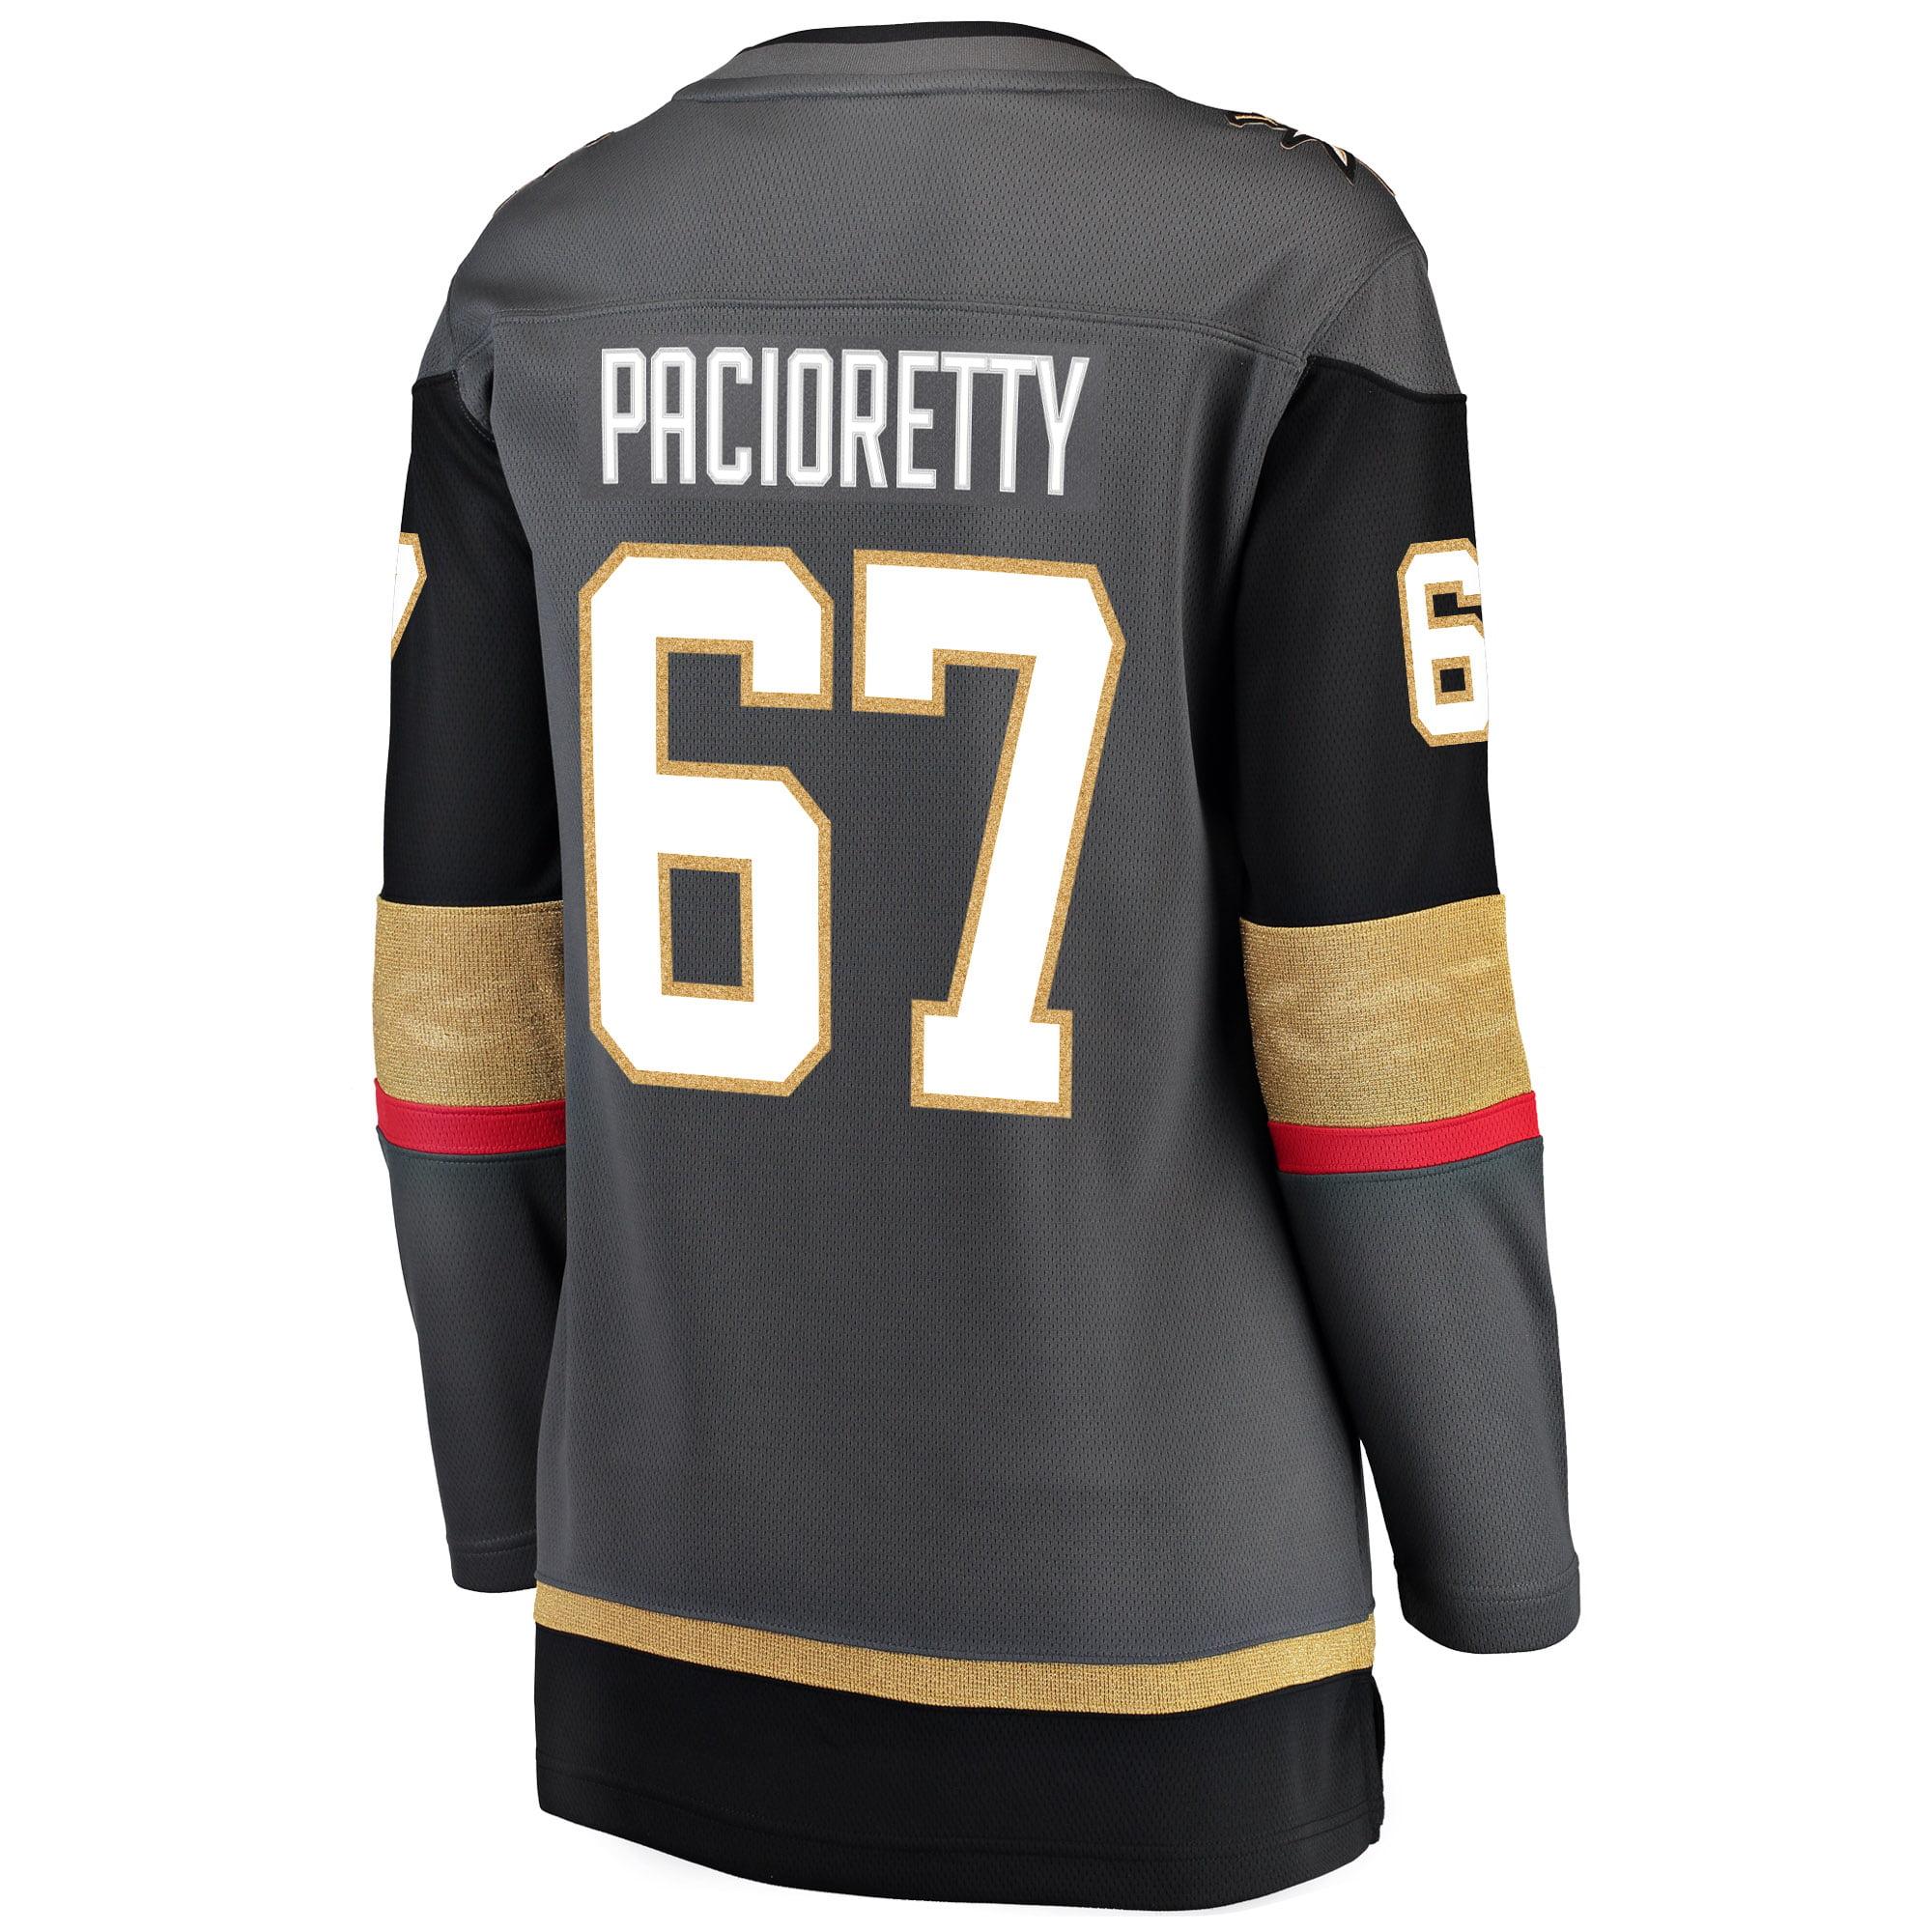 1d1fd7f19 Max Pacioretty Vegas Golden Knights Fanatics Branded Women s Breakaway  Player Jersey - Black - Walmart.com